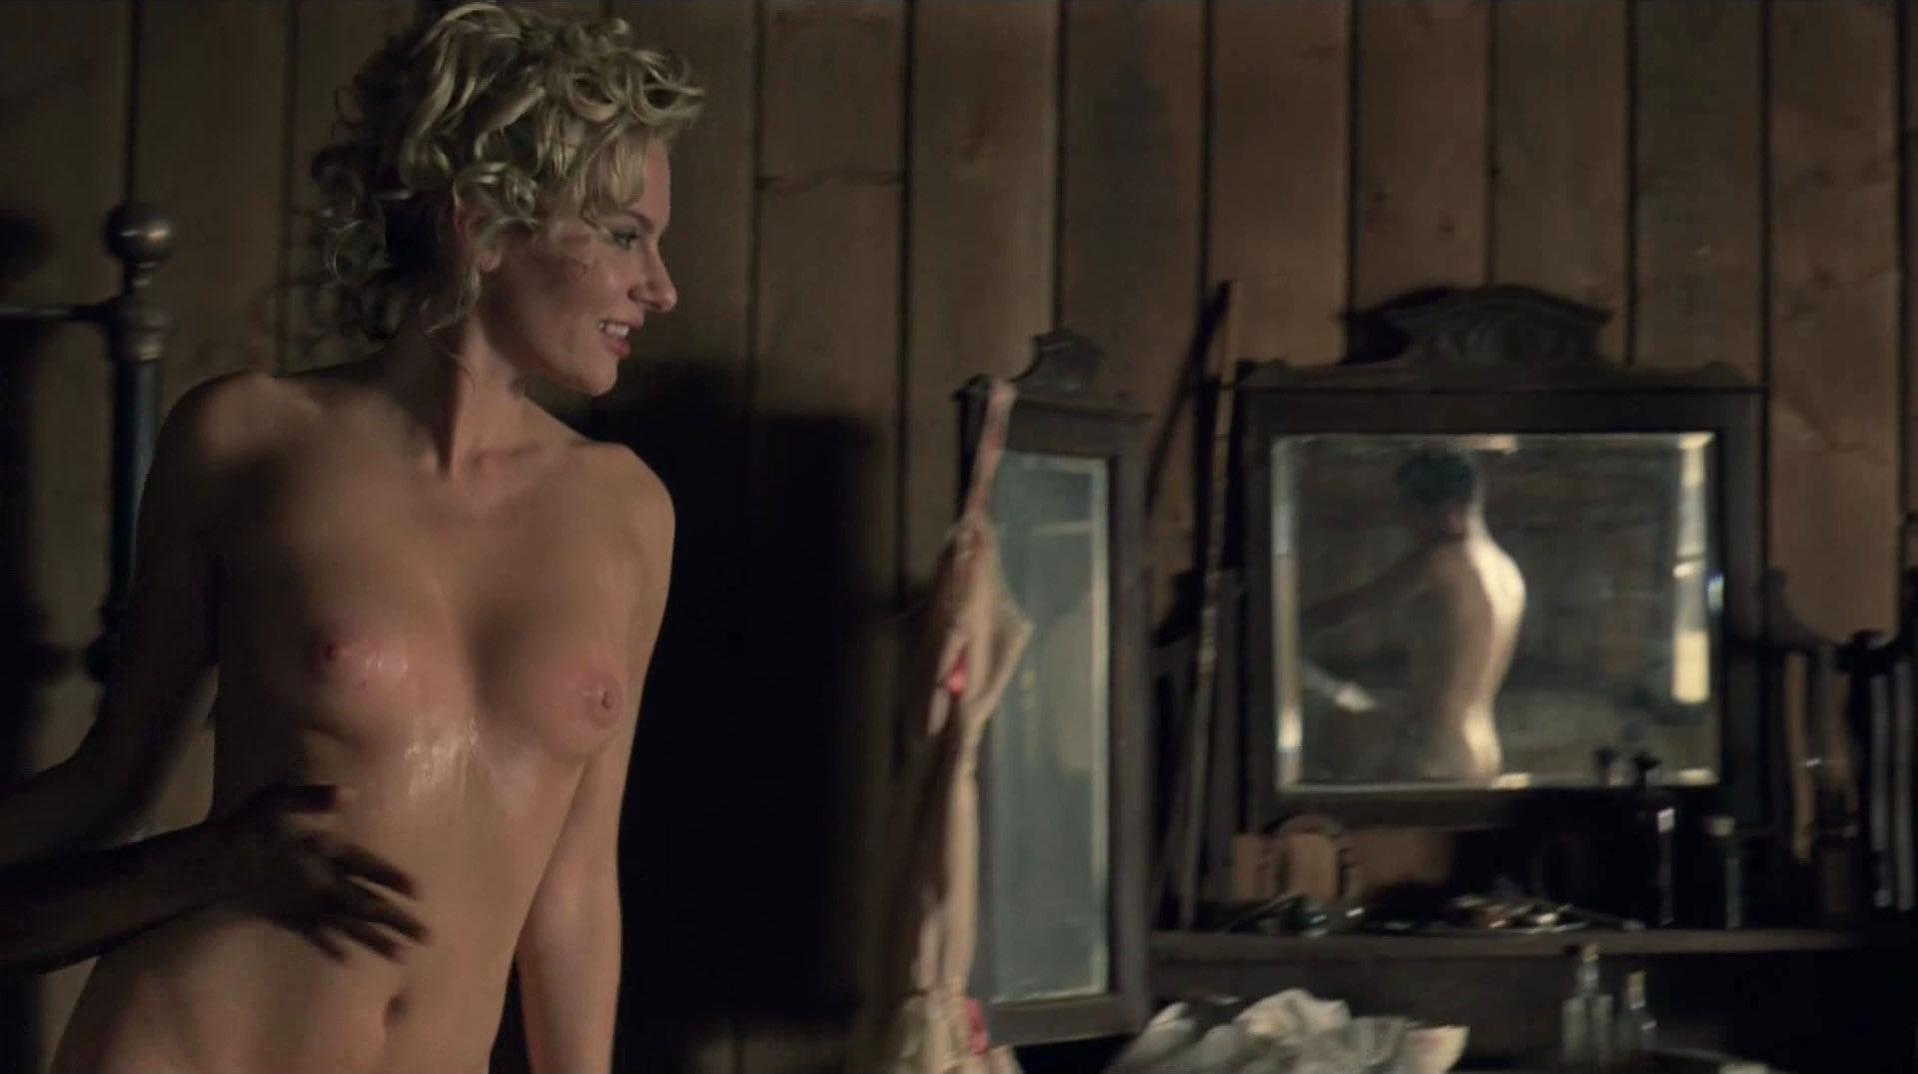 Jackie Moore nude - Westworld s01e01 (2016)